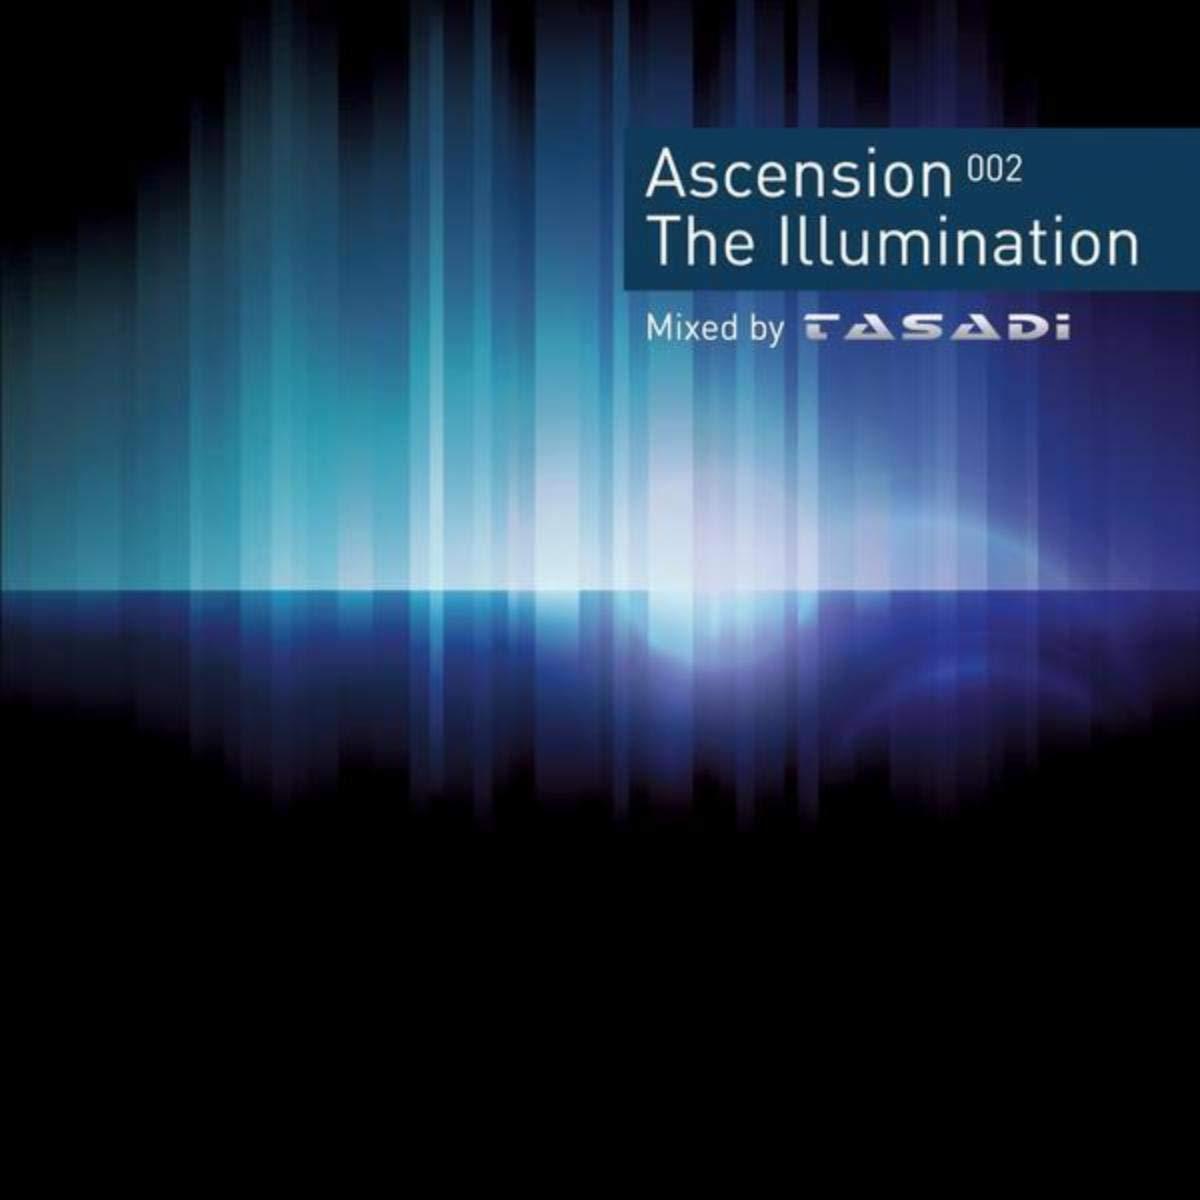 VA - Ascension 002 The Illumination  Mixed by Tasadi (2012) [FLAC] Download